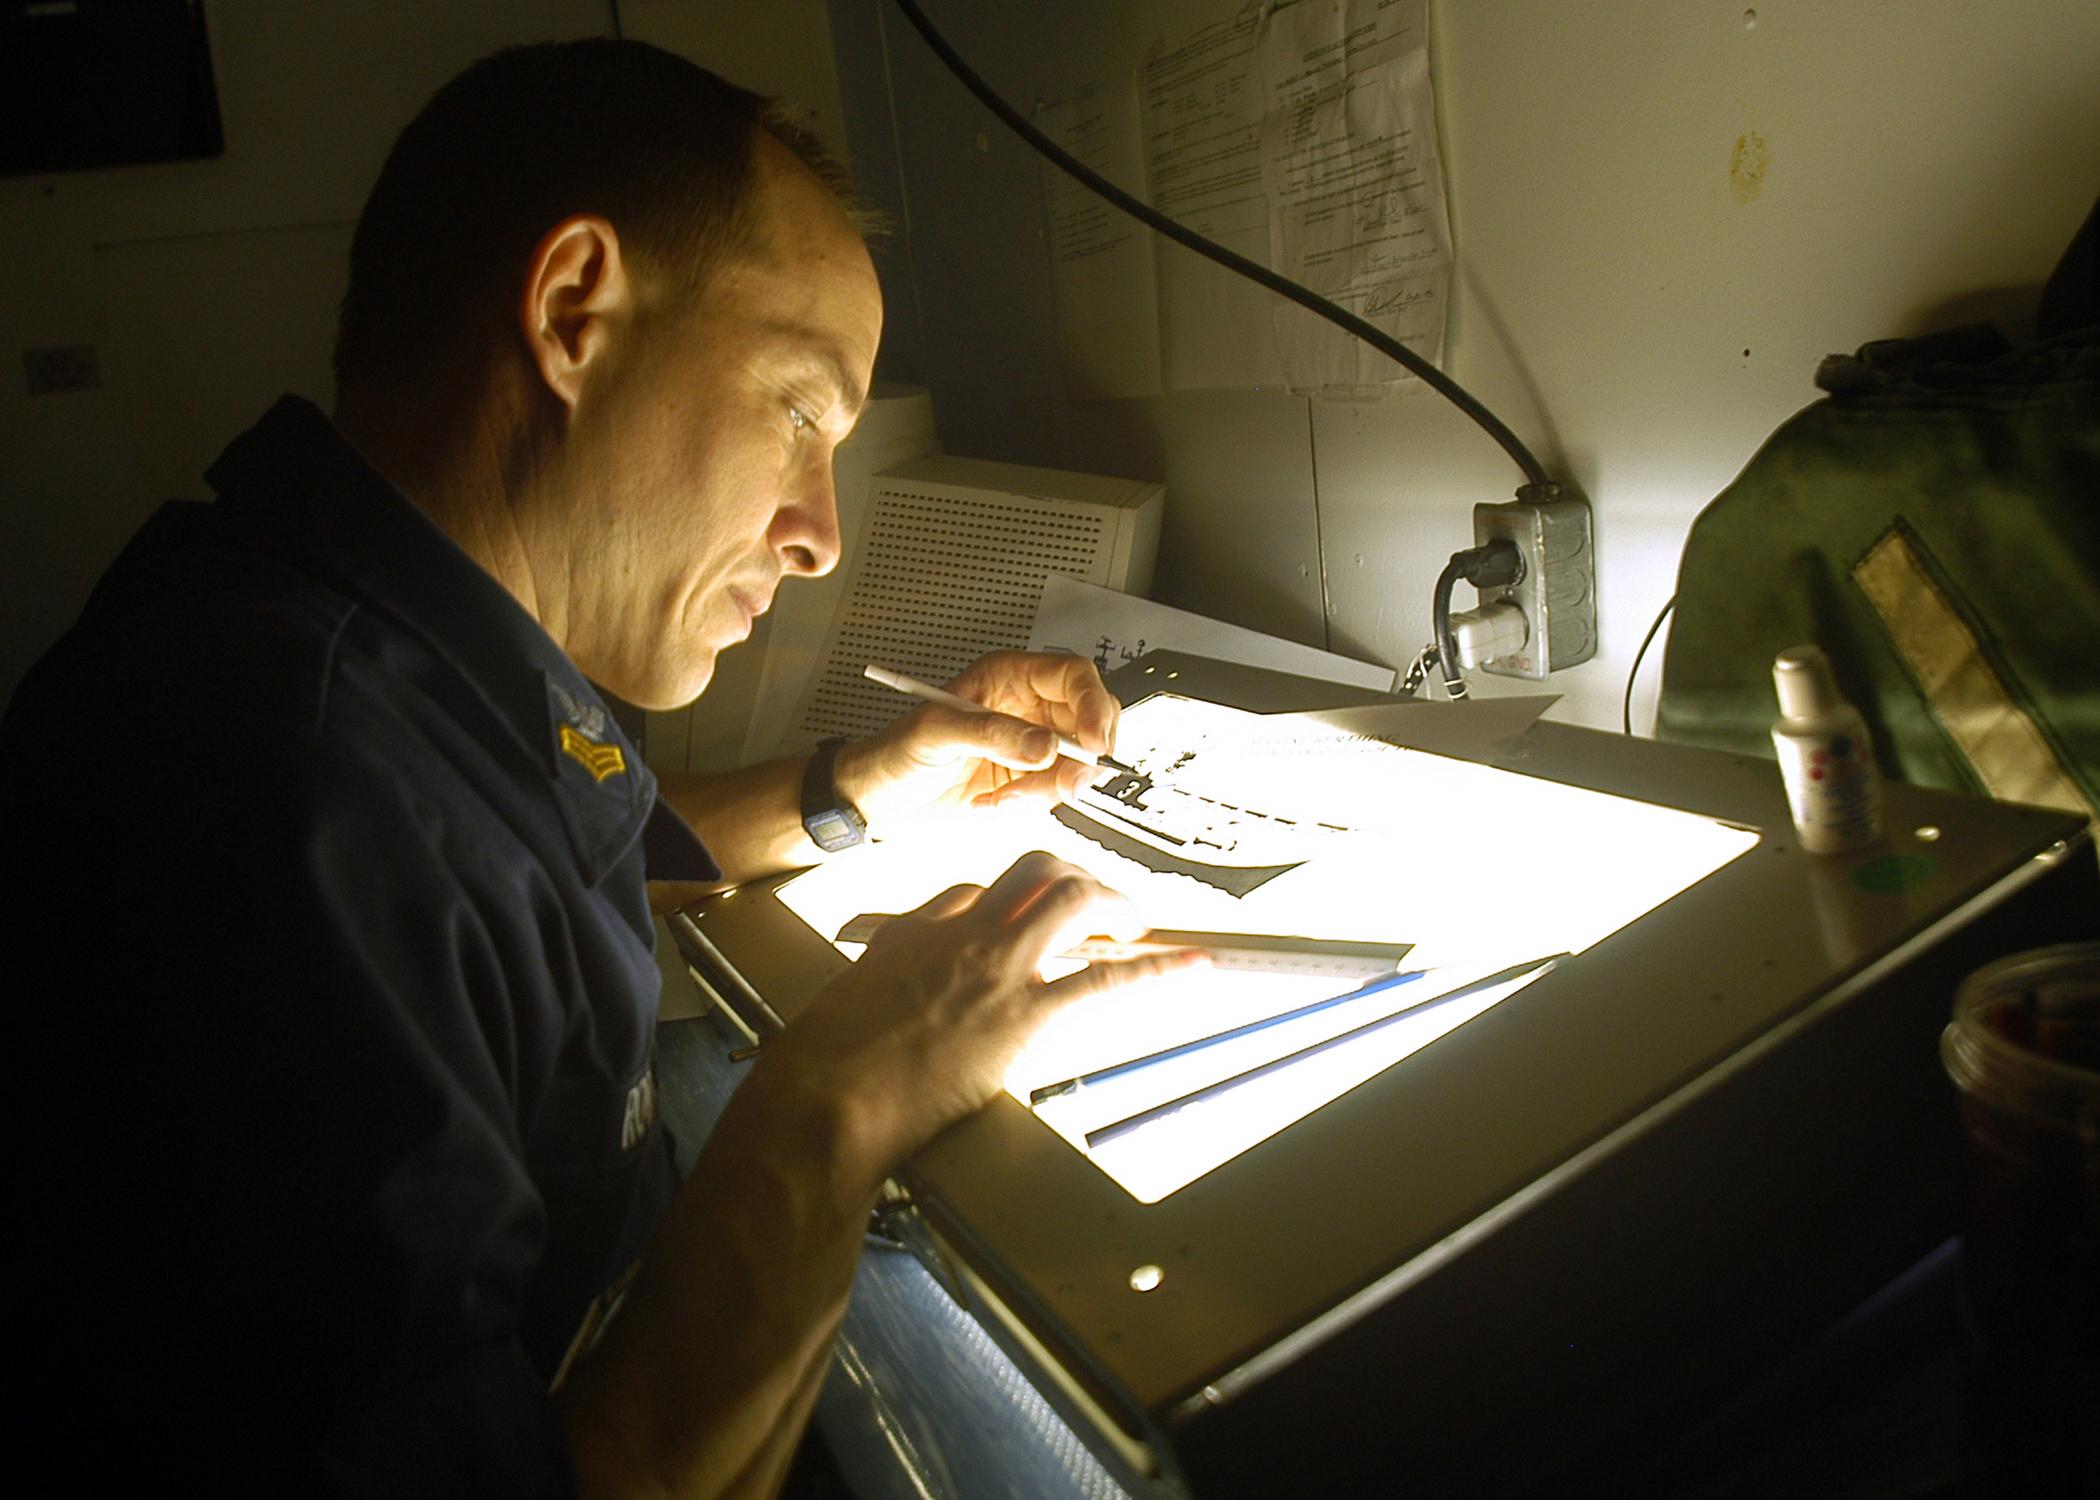 Diy light box for film negatives